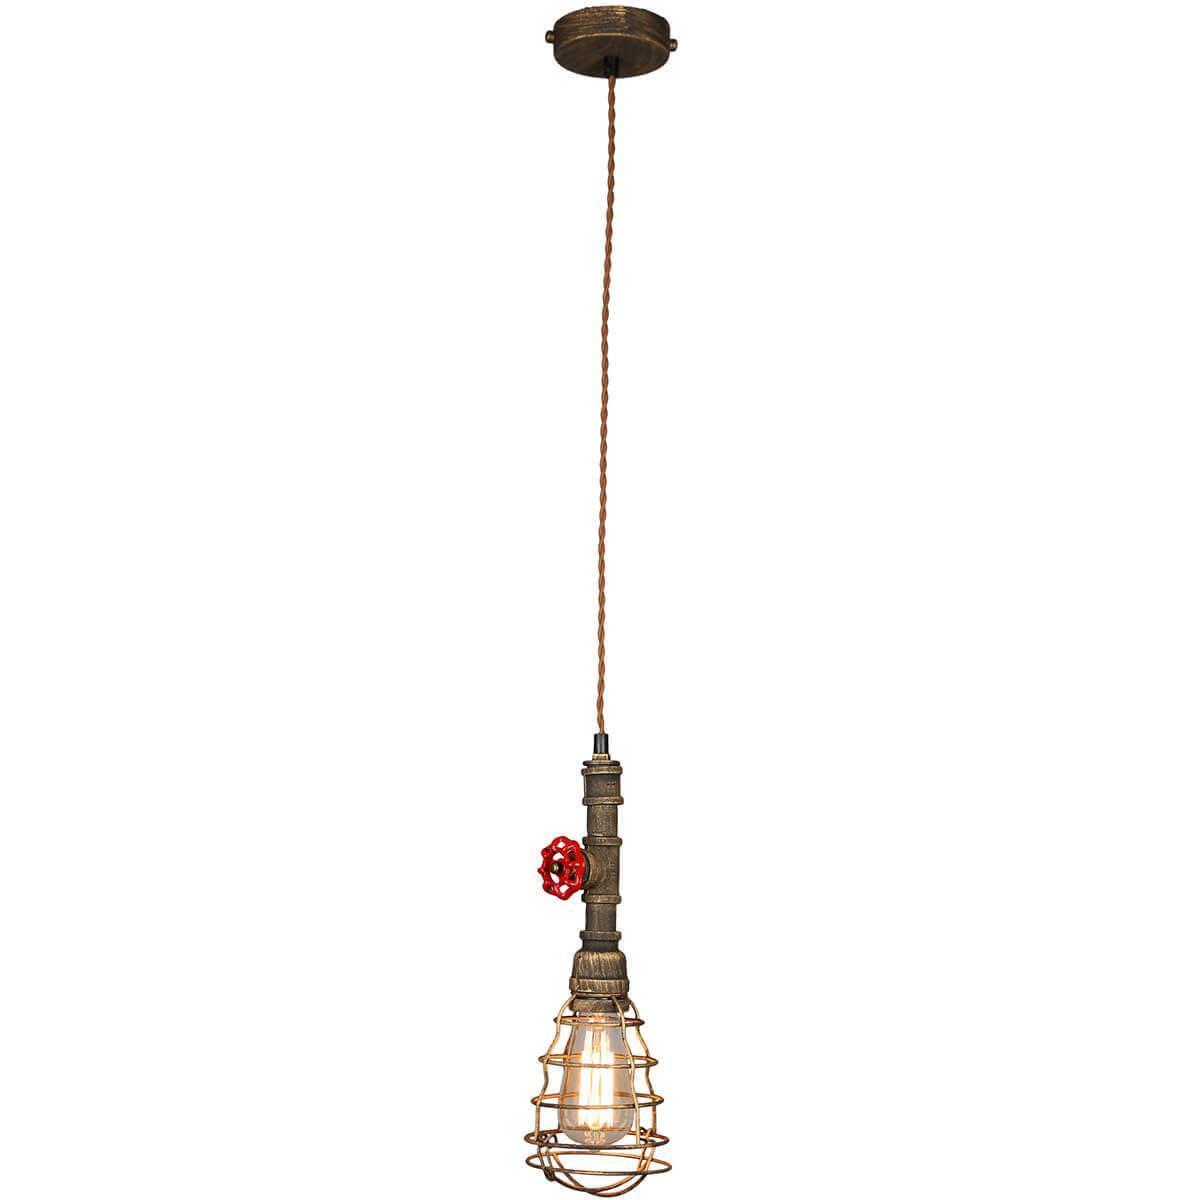 Подвесной светильник Omnilux OML-90516-01, E27, 60 Вт